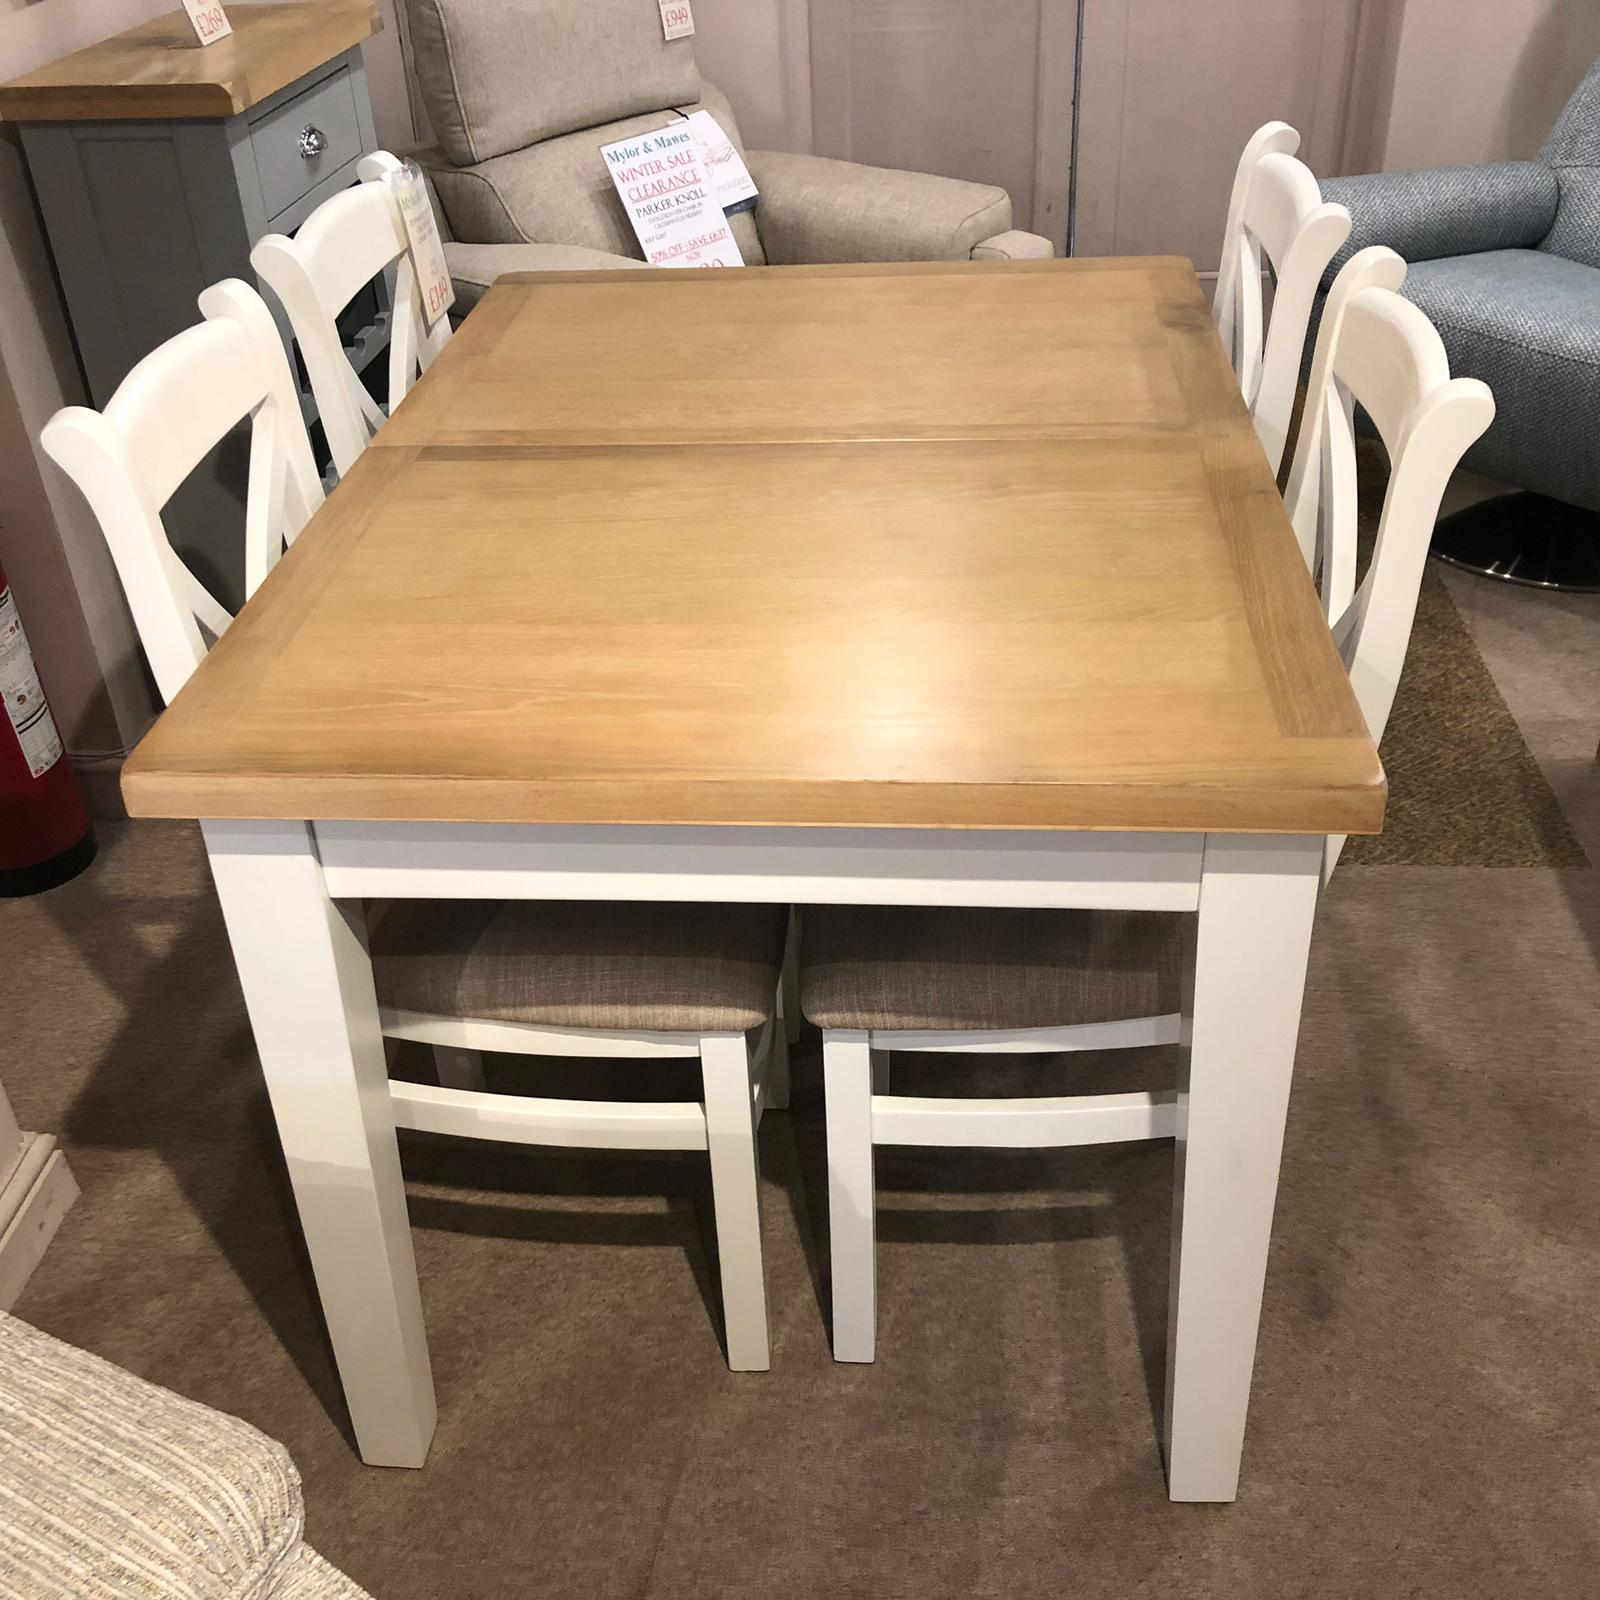 mylor mawes specialist in fine furniture rh mylorandmawes com